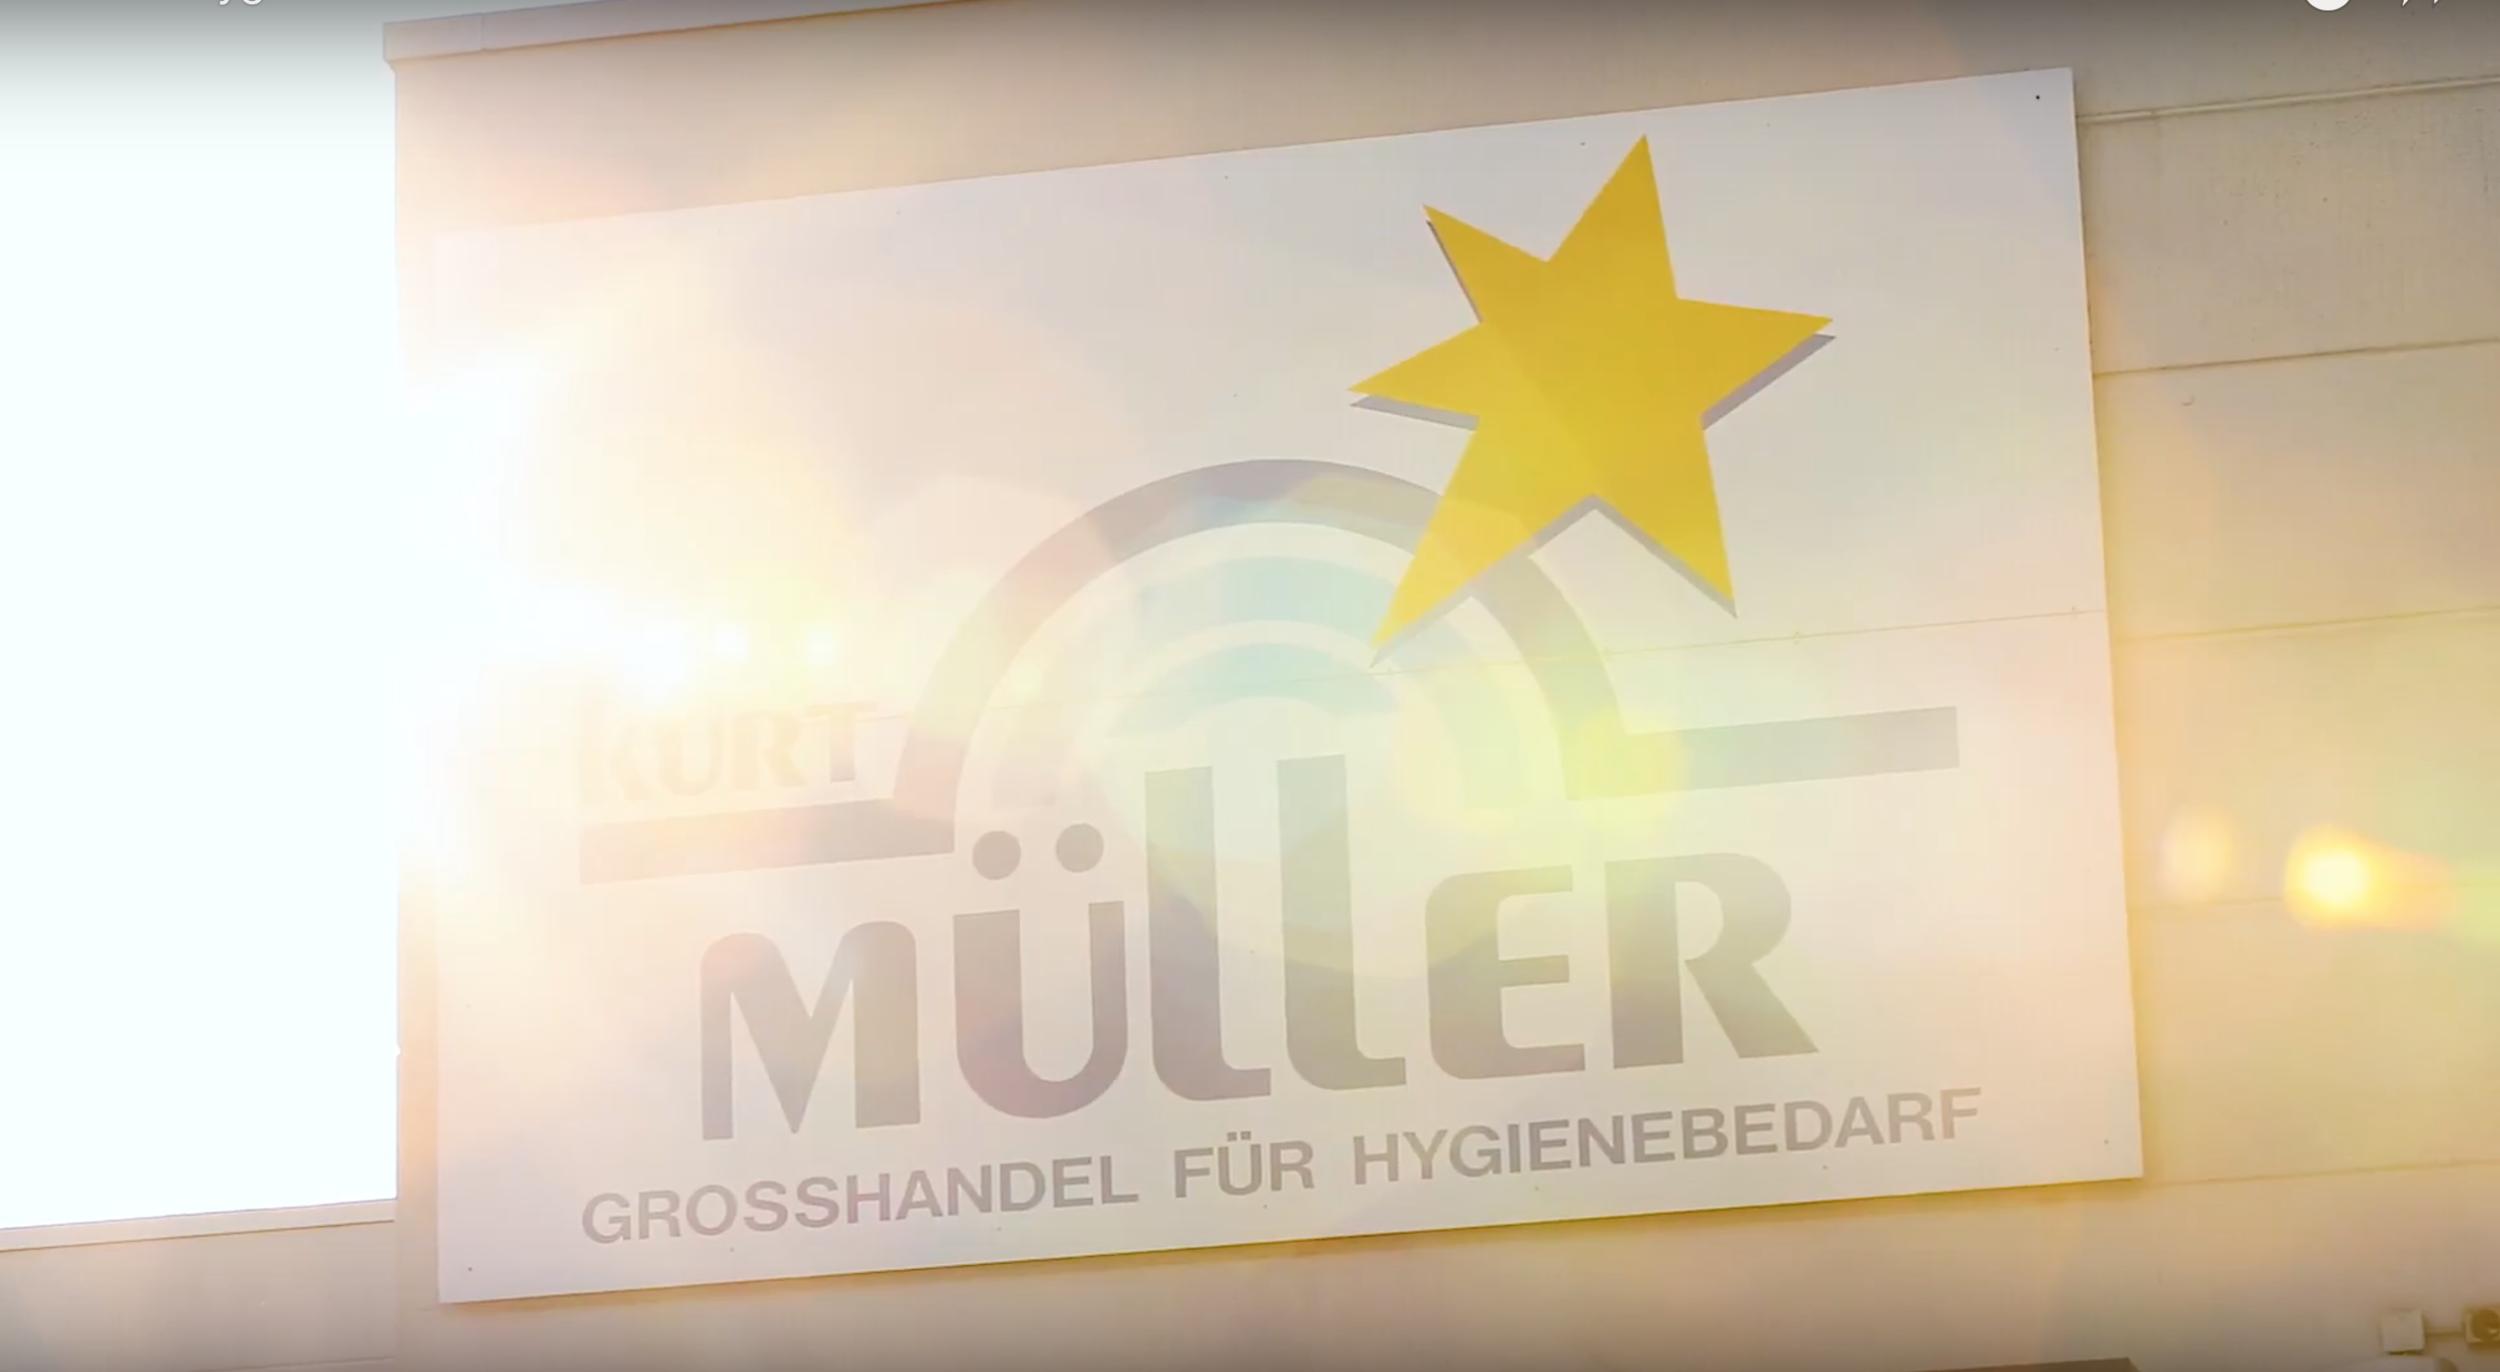 KURT MÜLLER GMBH - Phone Image, Service Design